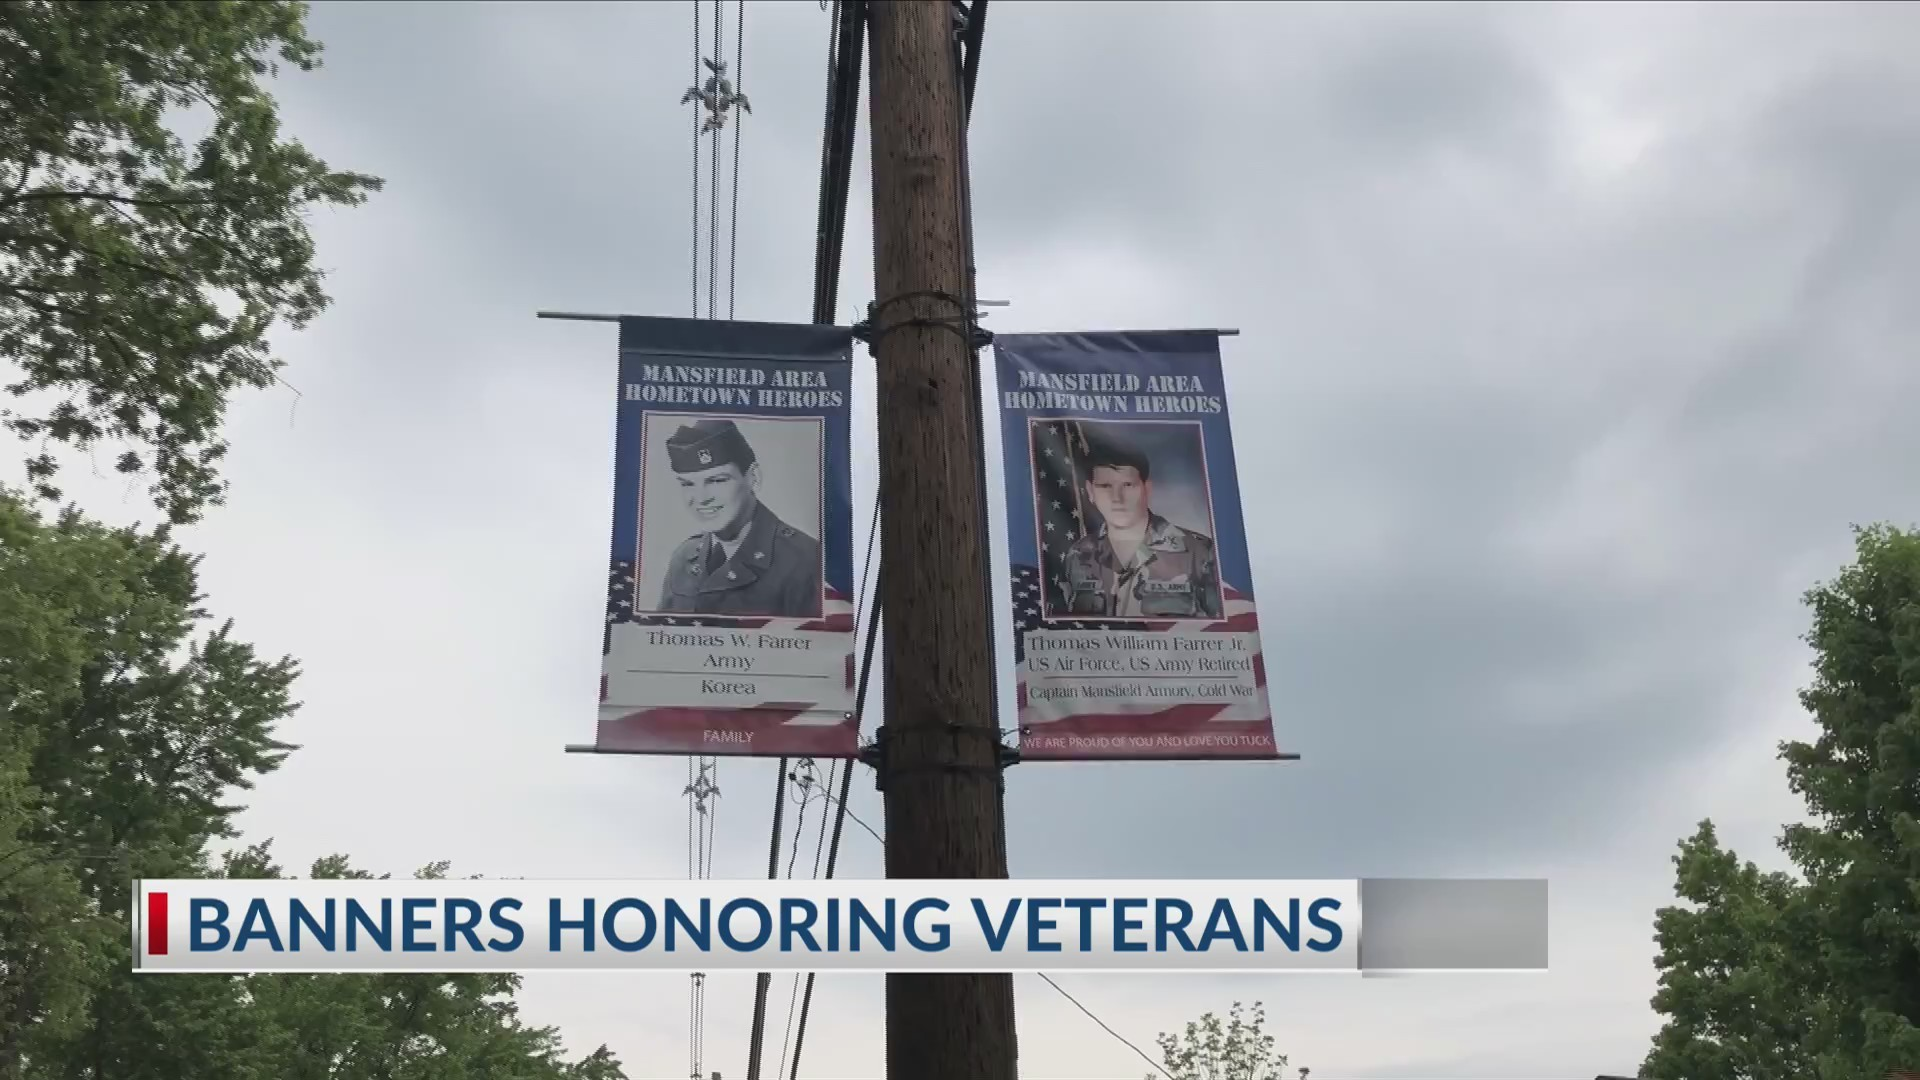 Banners honoring veterans